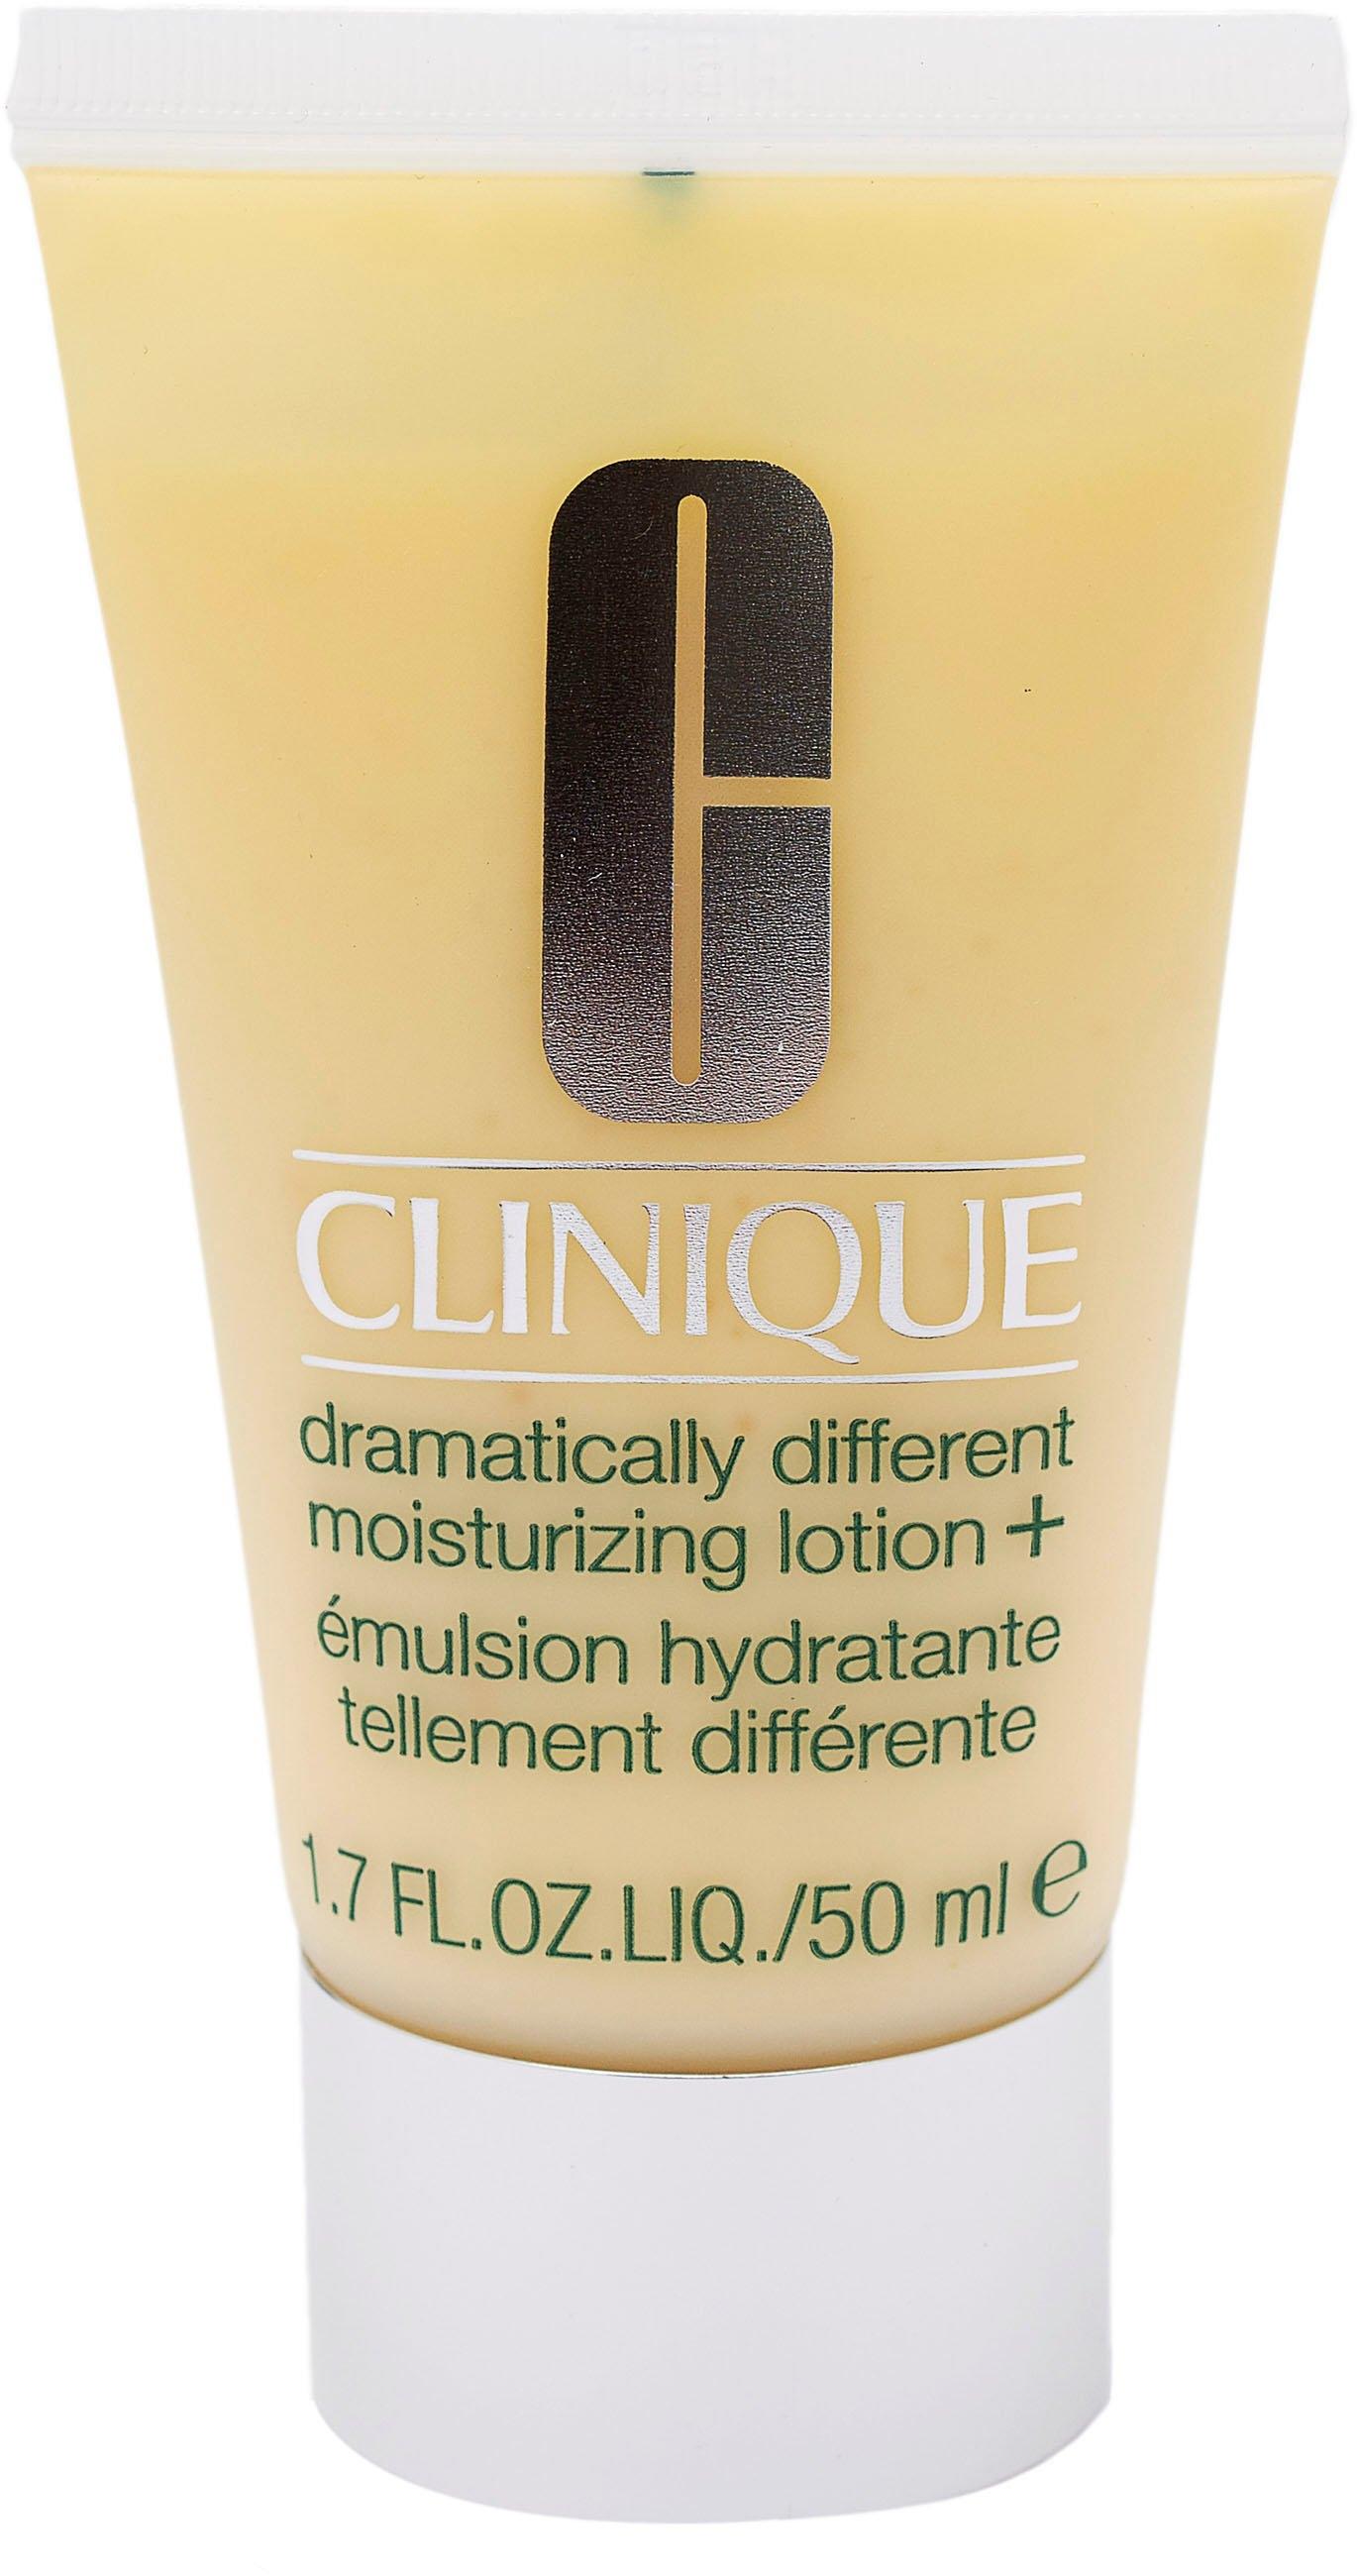 CLINIQUE vochtinbrengende crème Dramatically Different Moisturizing Lotion+ - gratis ruilen op otto.nl